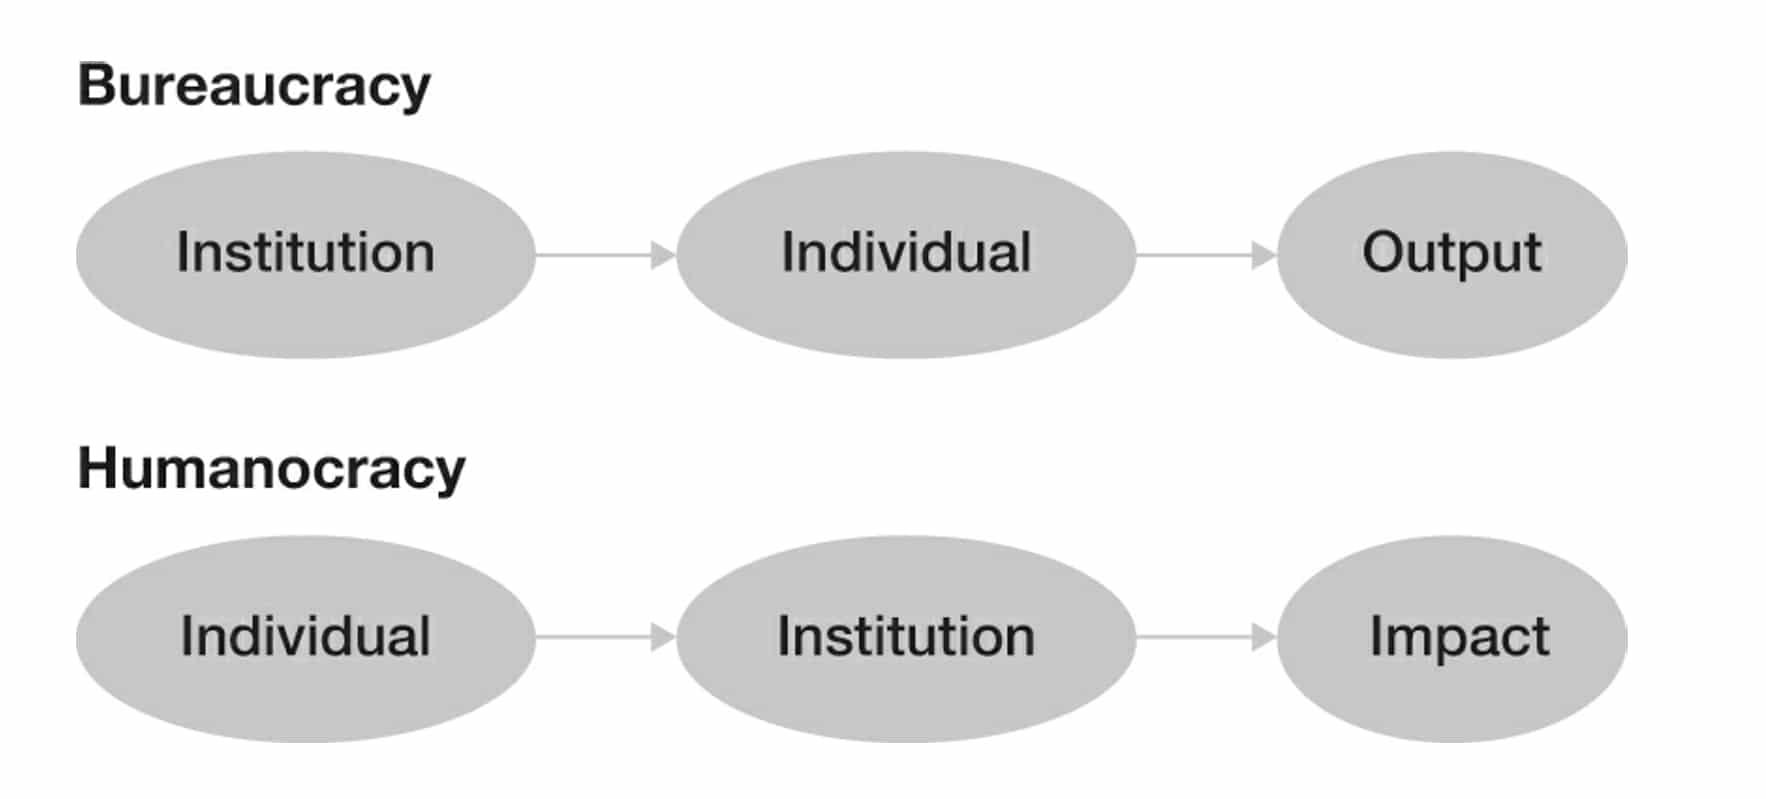 Humanocracy Bureaucracy vs Humanocracy1